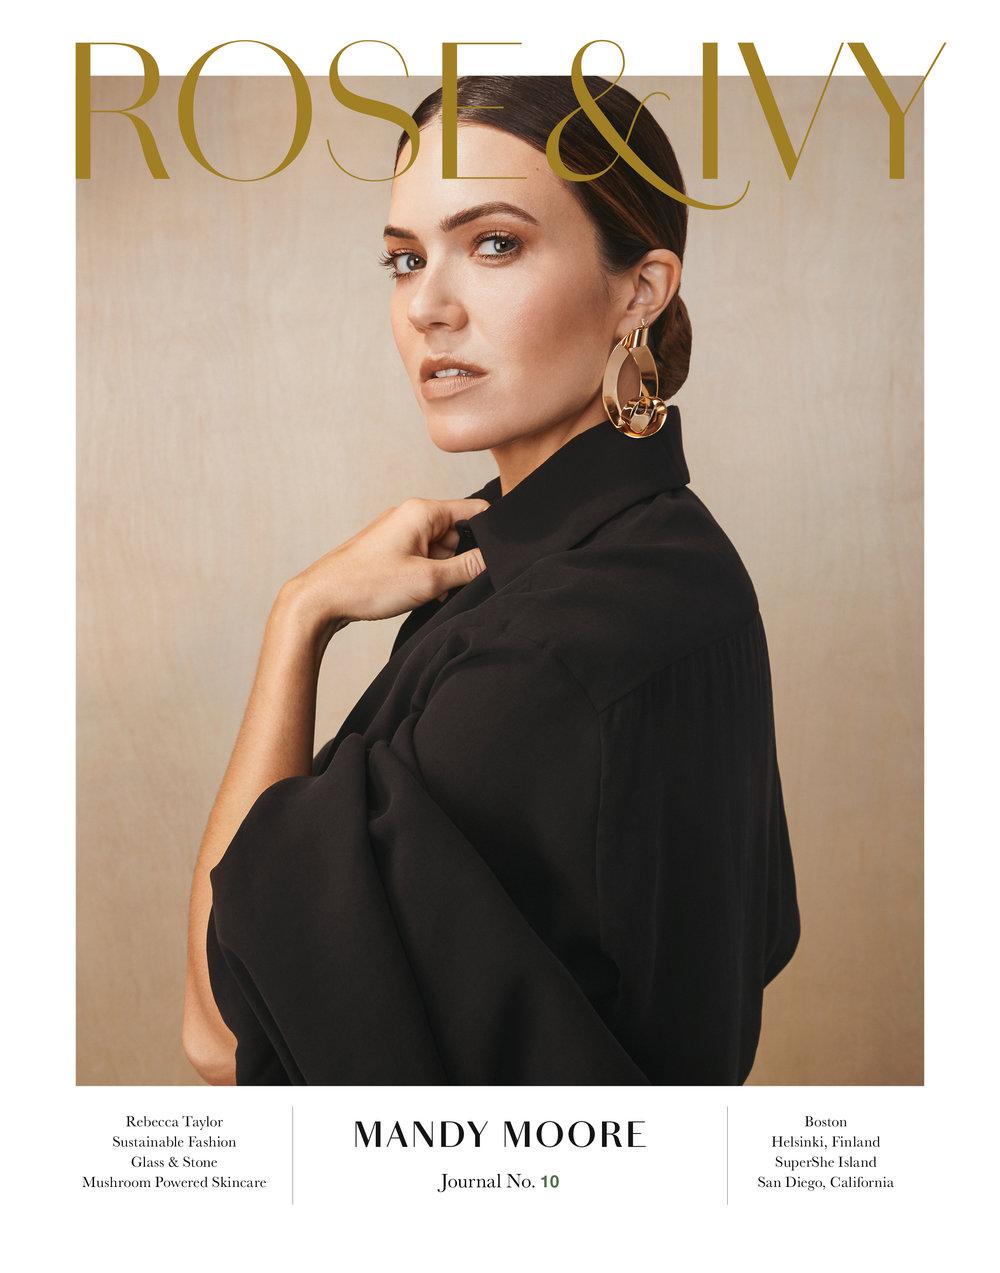 ROSE & IVY Journal Issue No.10 Starring Mandy Moore.jpg